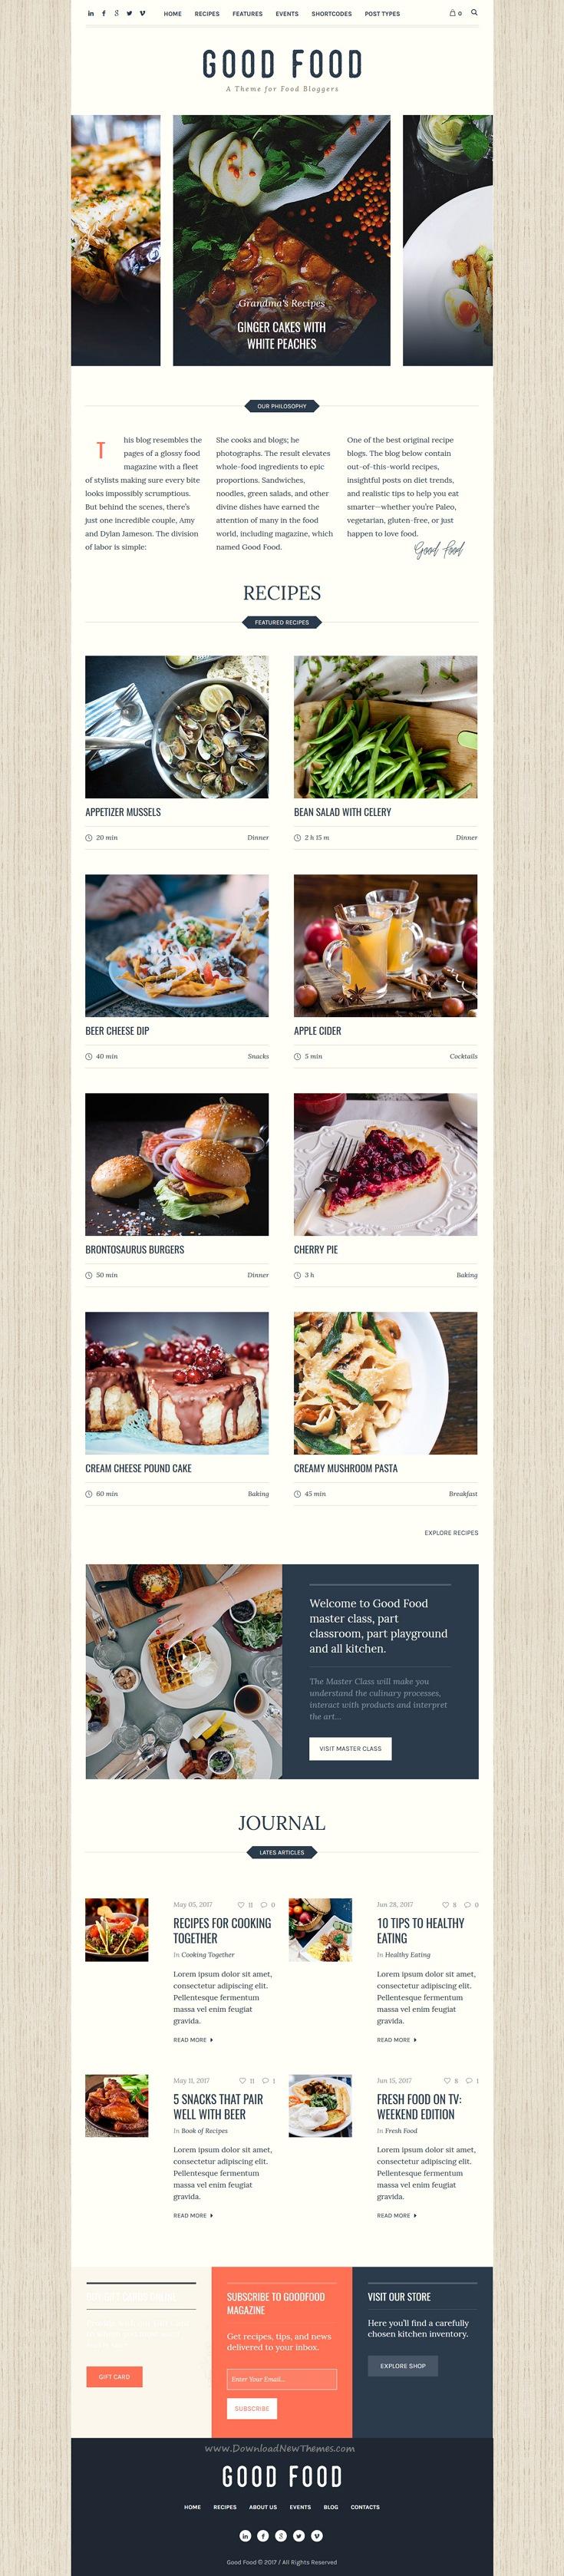 Good food recipe magazine food blogging theme magazine website good food recipe magazine food blogging theme forumfinder Gallery